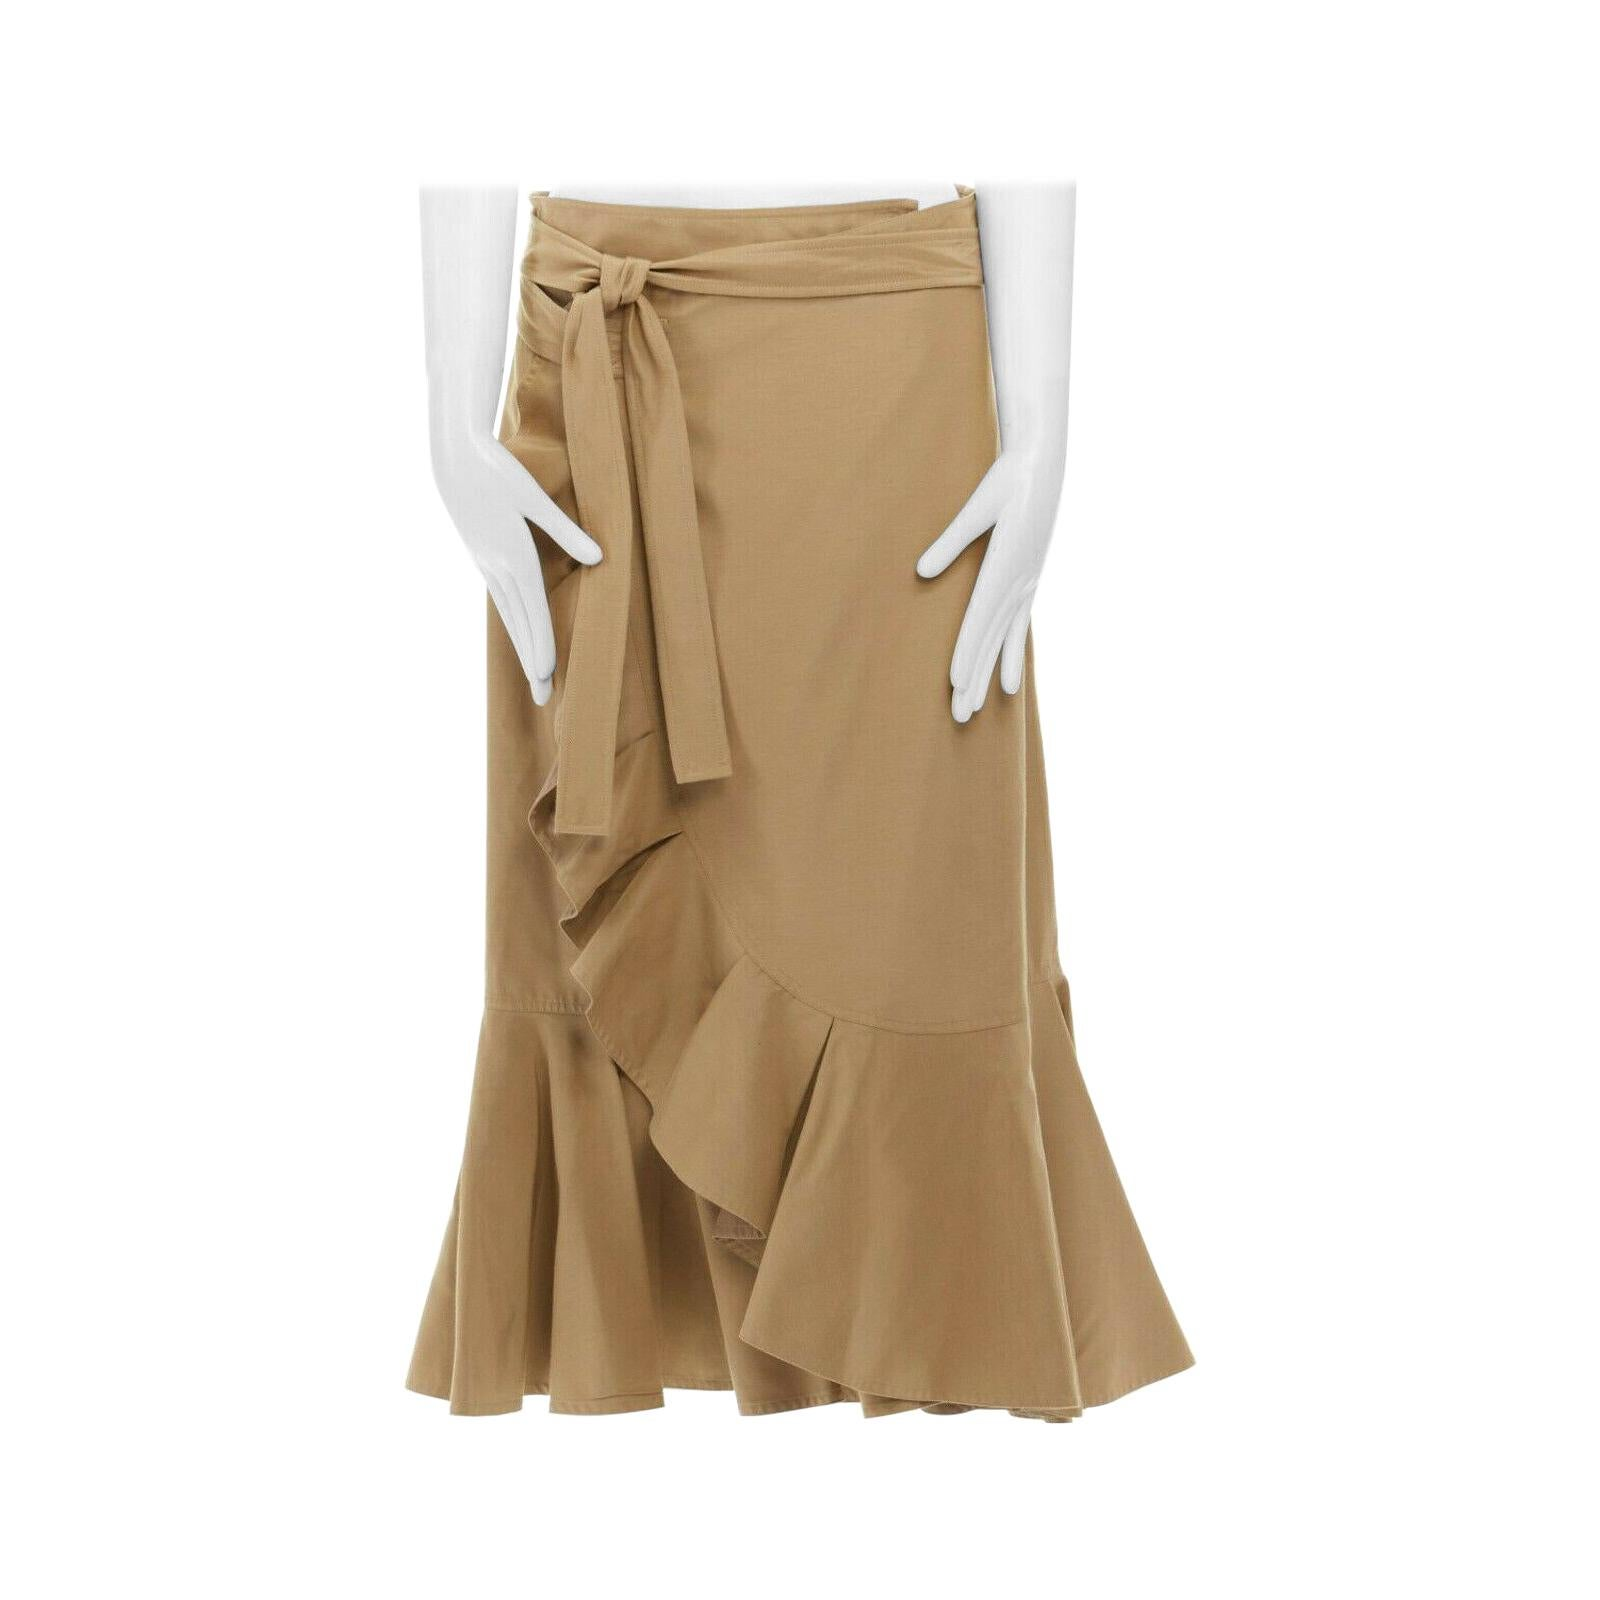 runway CELINE PHILO khaki beige ruffle hem wraparound self tie knee skirt FR40